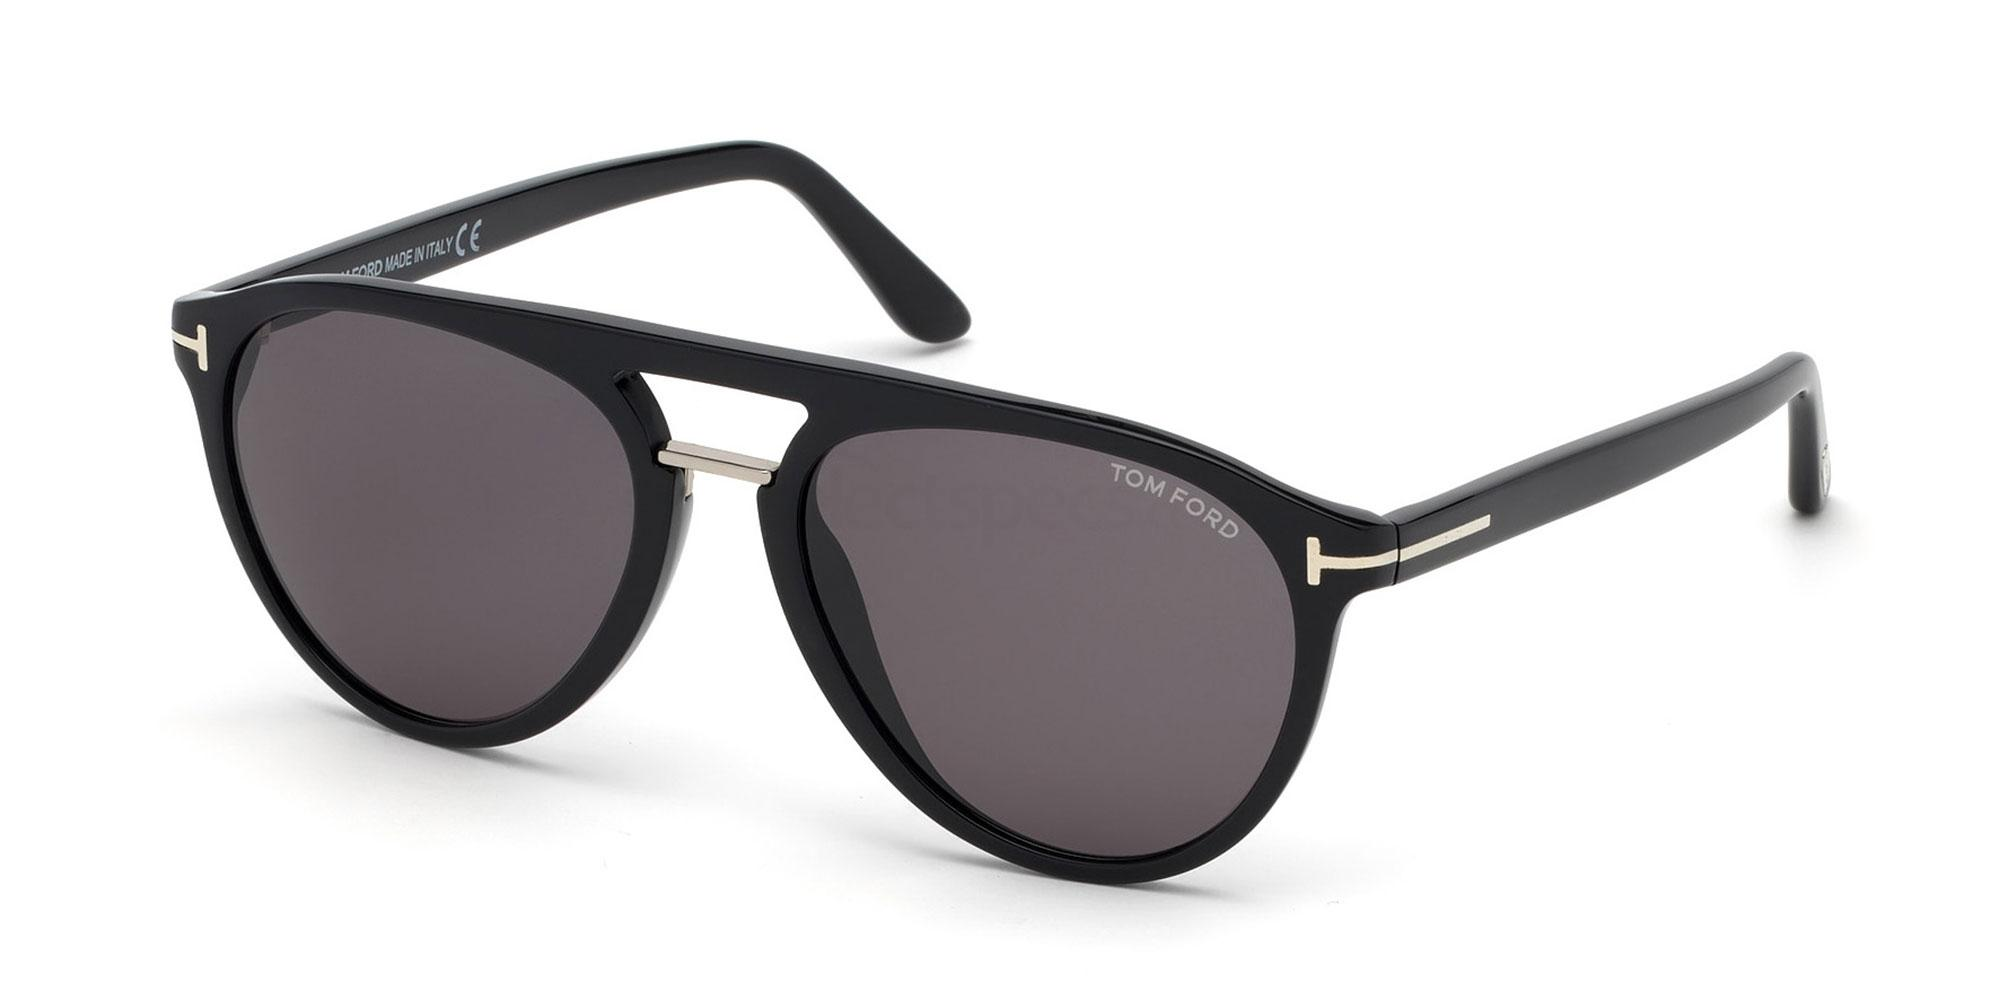 01C FT0697 Sunglasses, Tom Ford